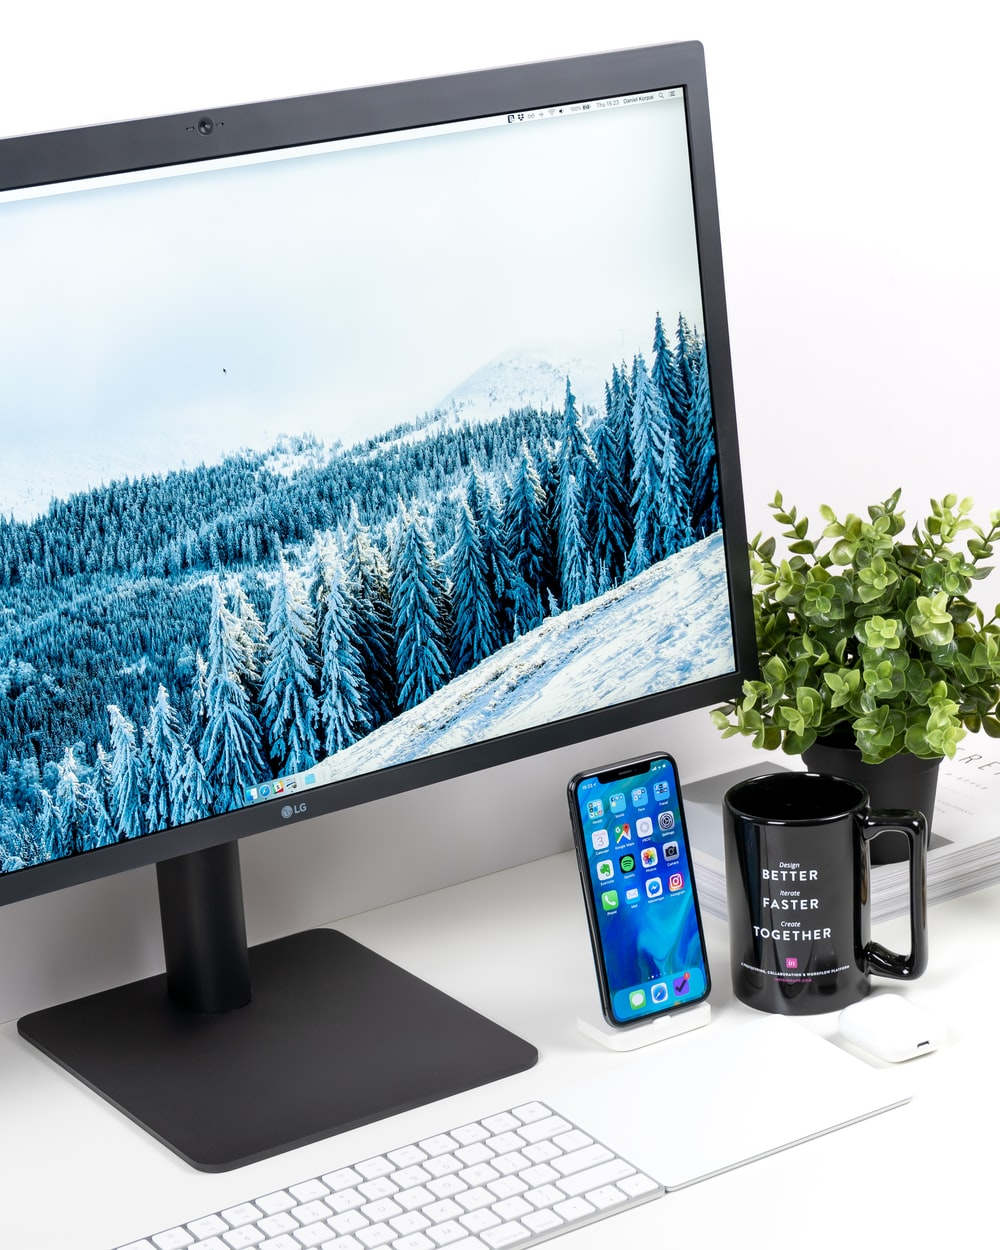 black LG monitor and white keyboard